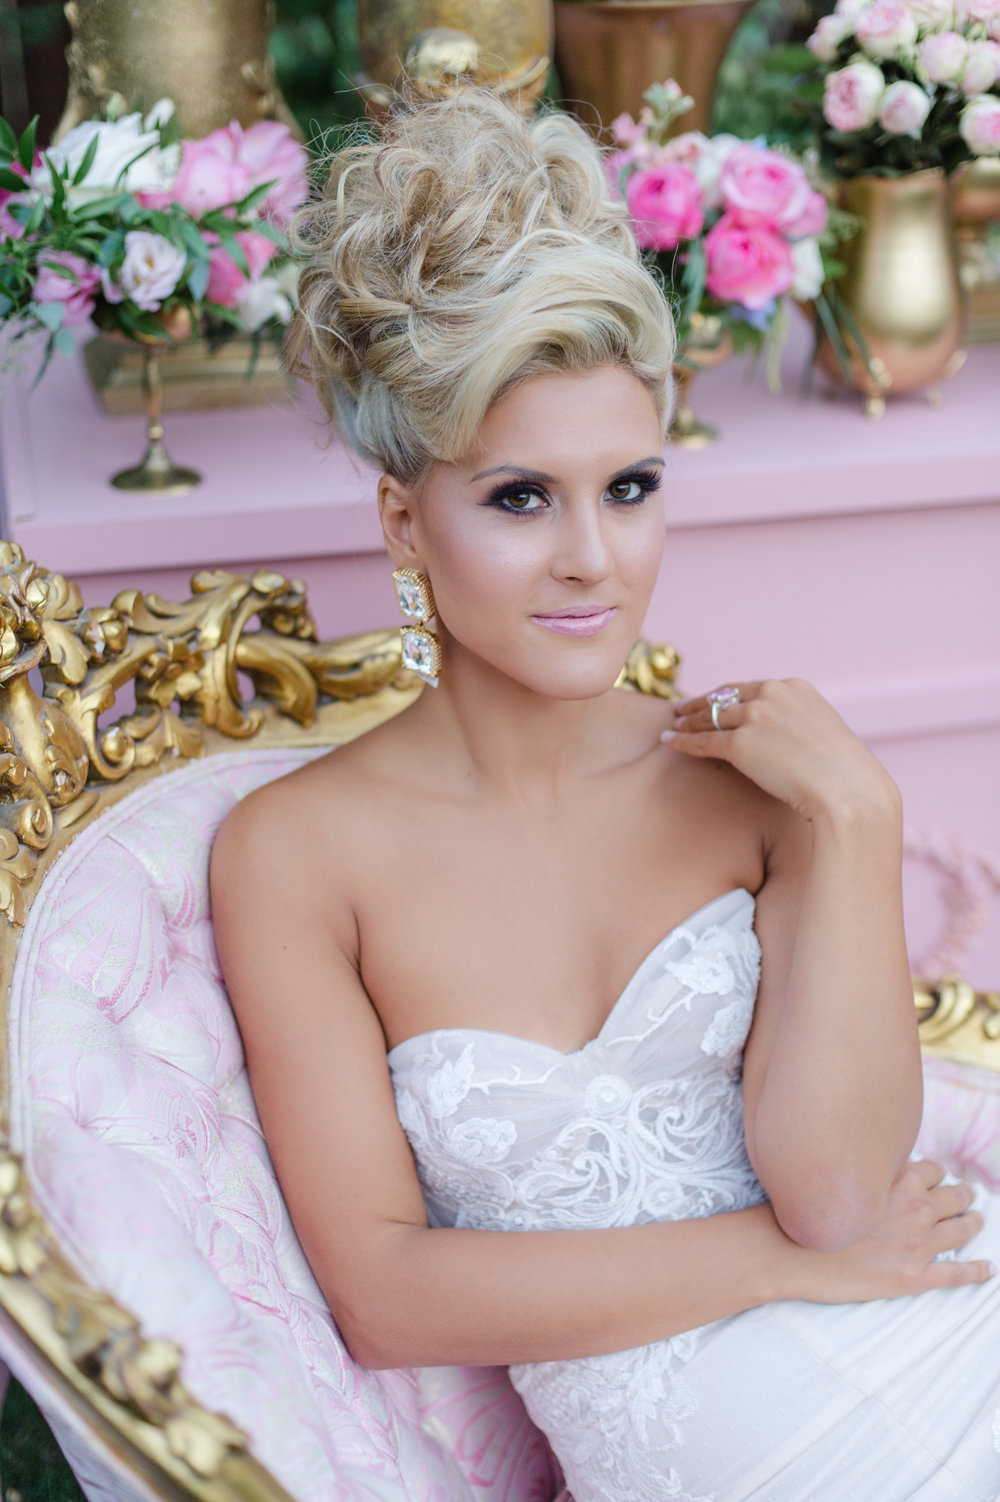 makeup-worx-mobile-wedding- makeup-hair-hamilton-12.jpg